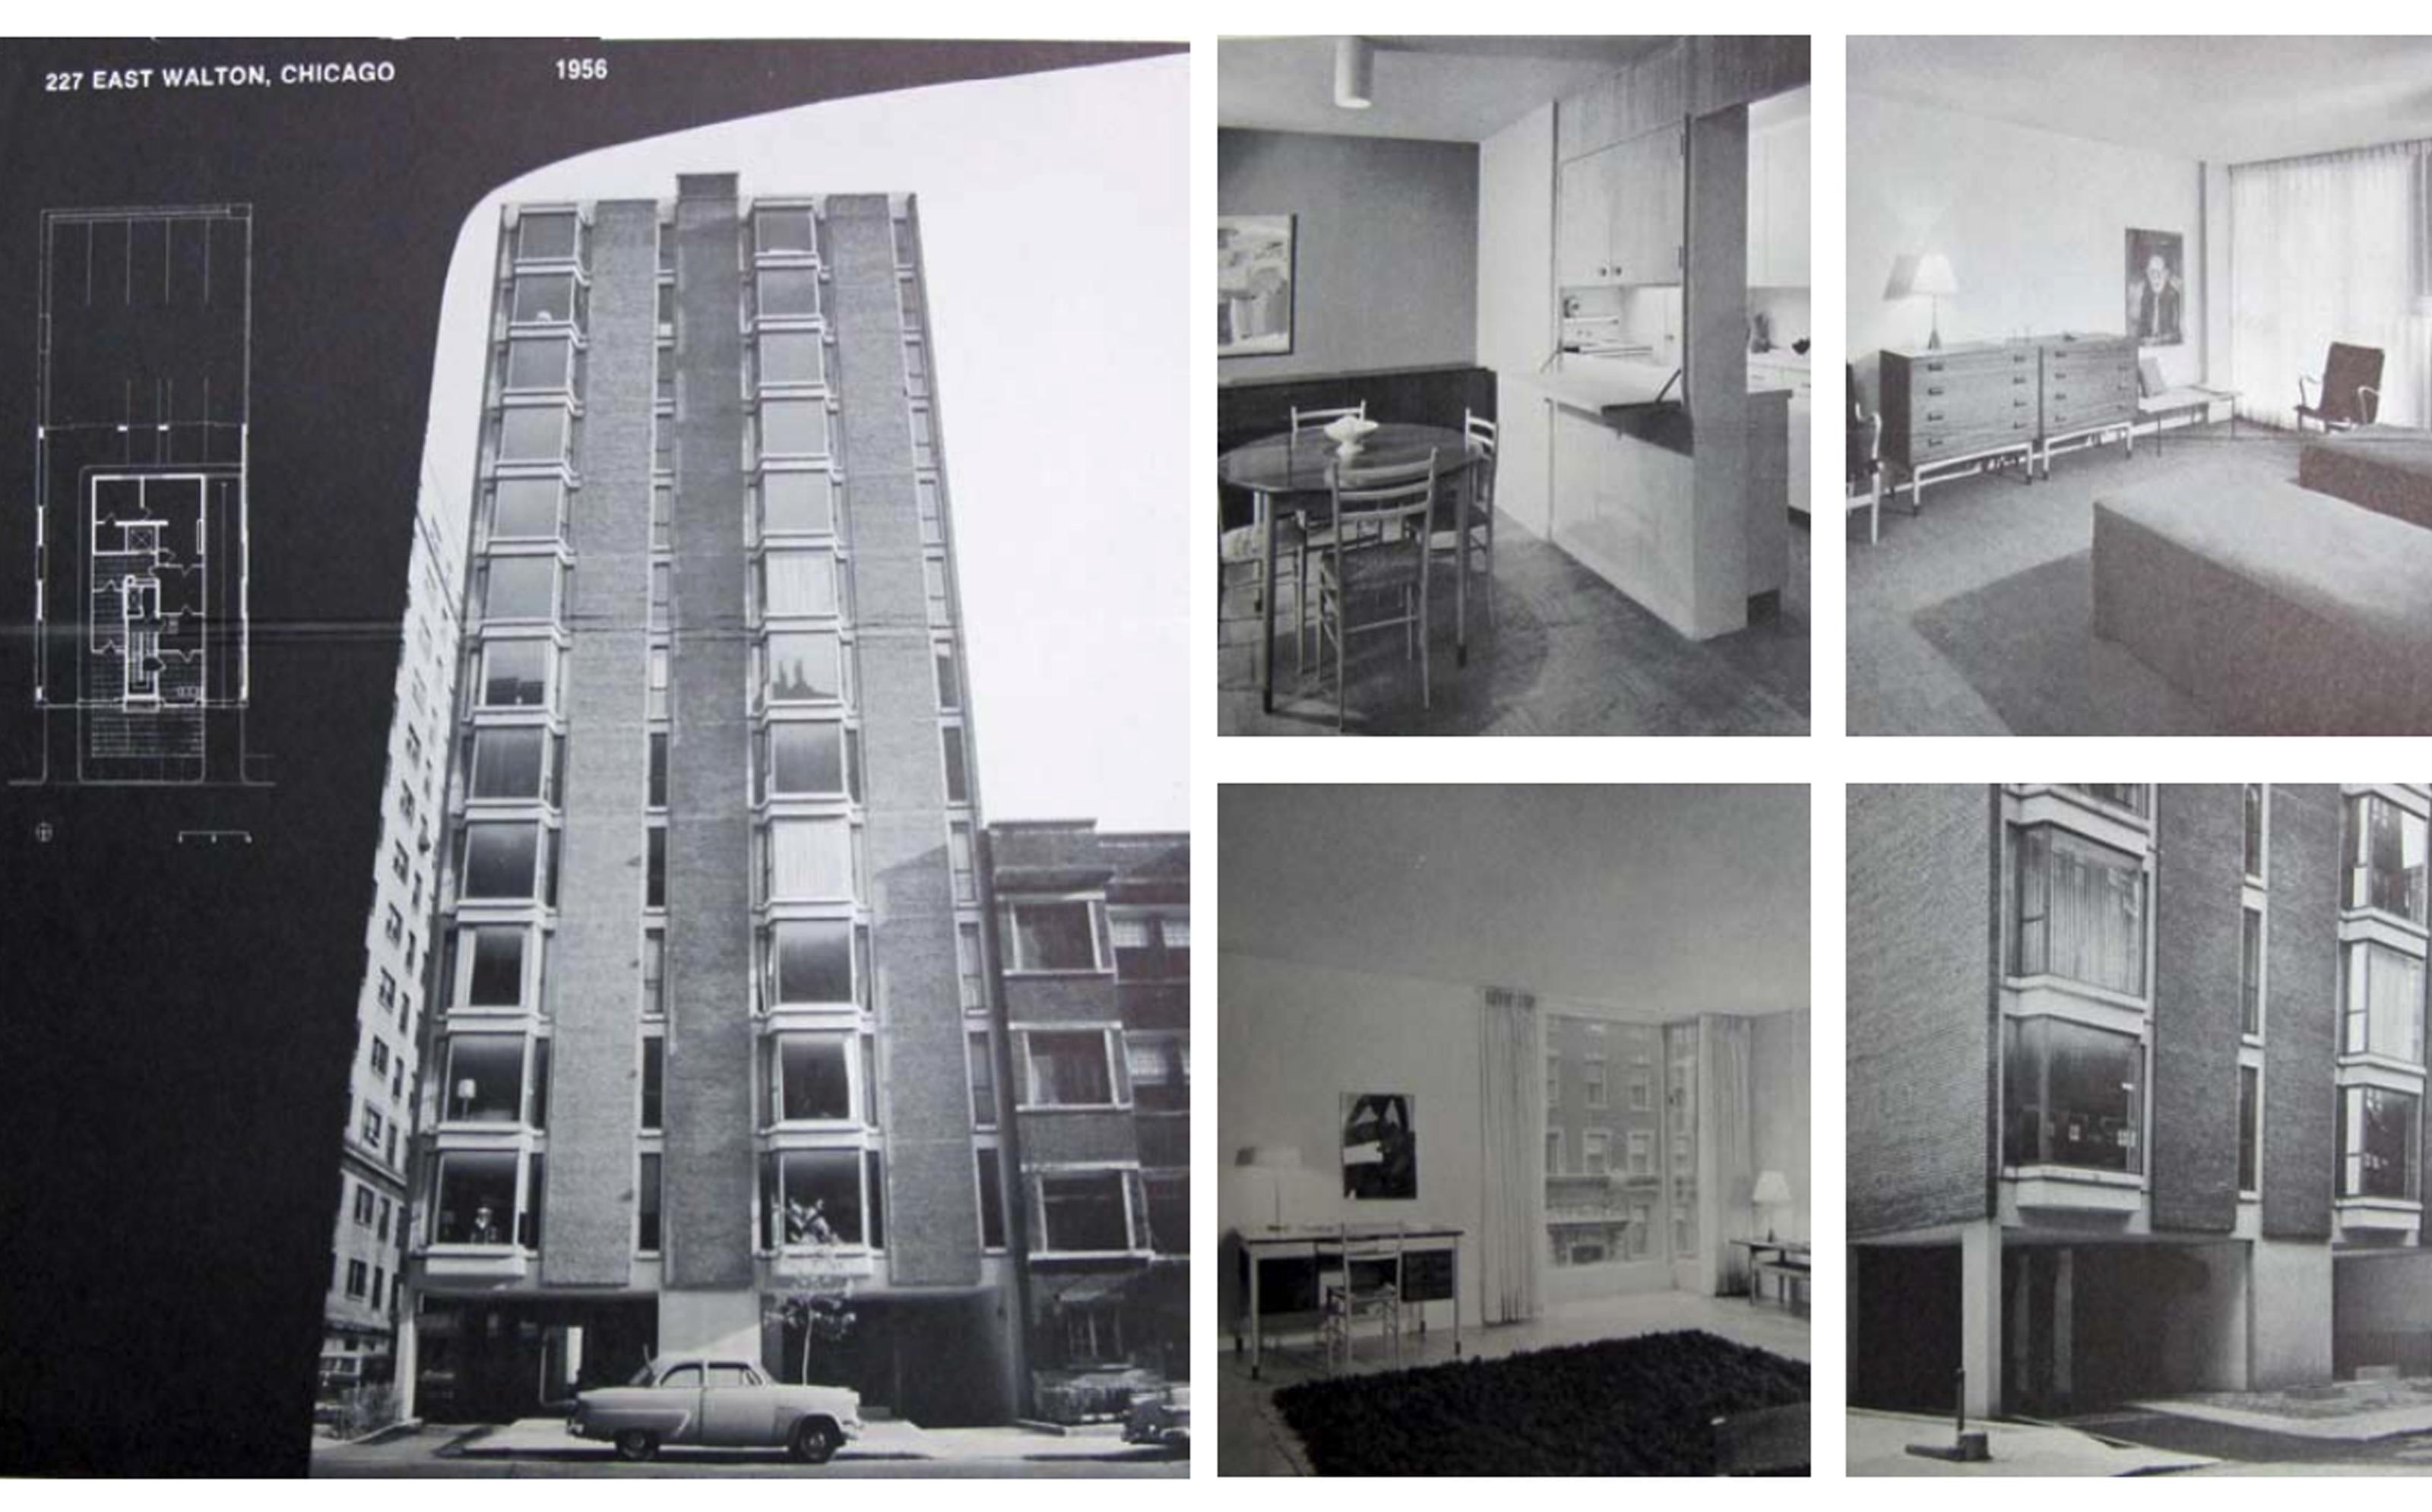 A 1956 marketing brochure for 227 E. Walton Place.